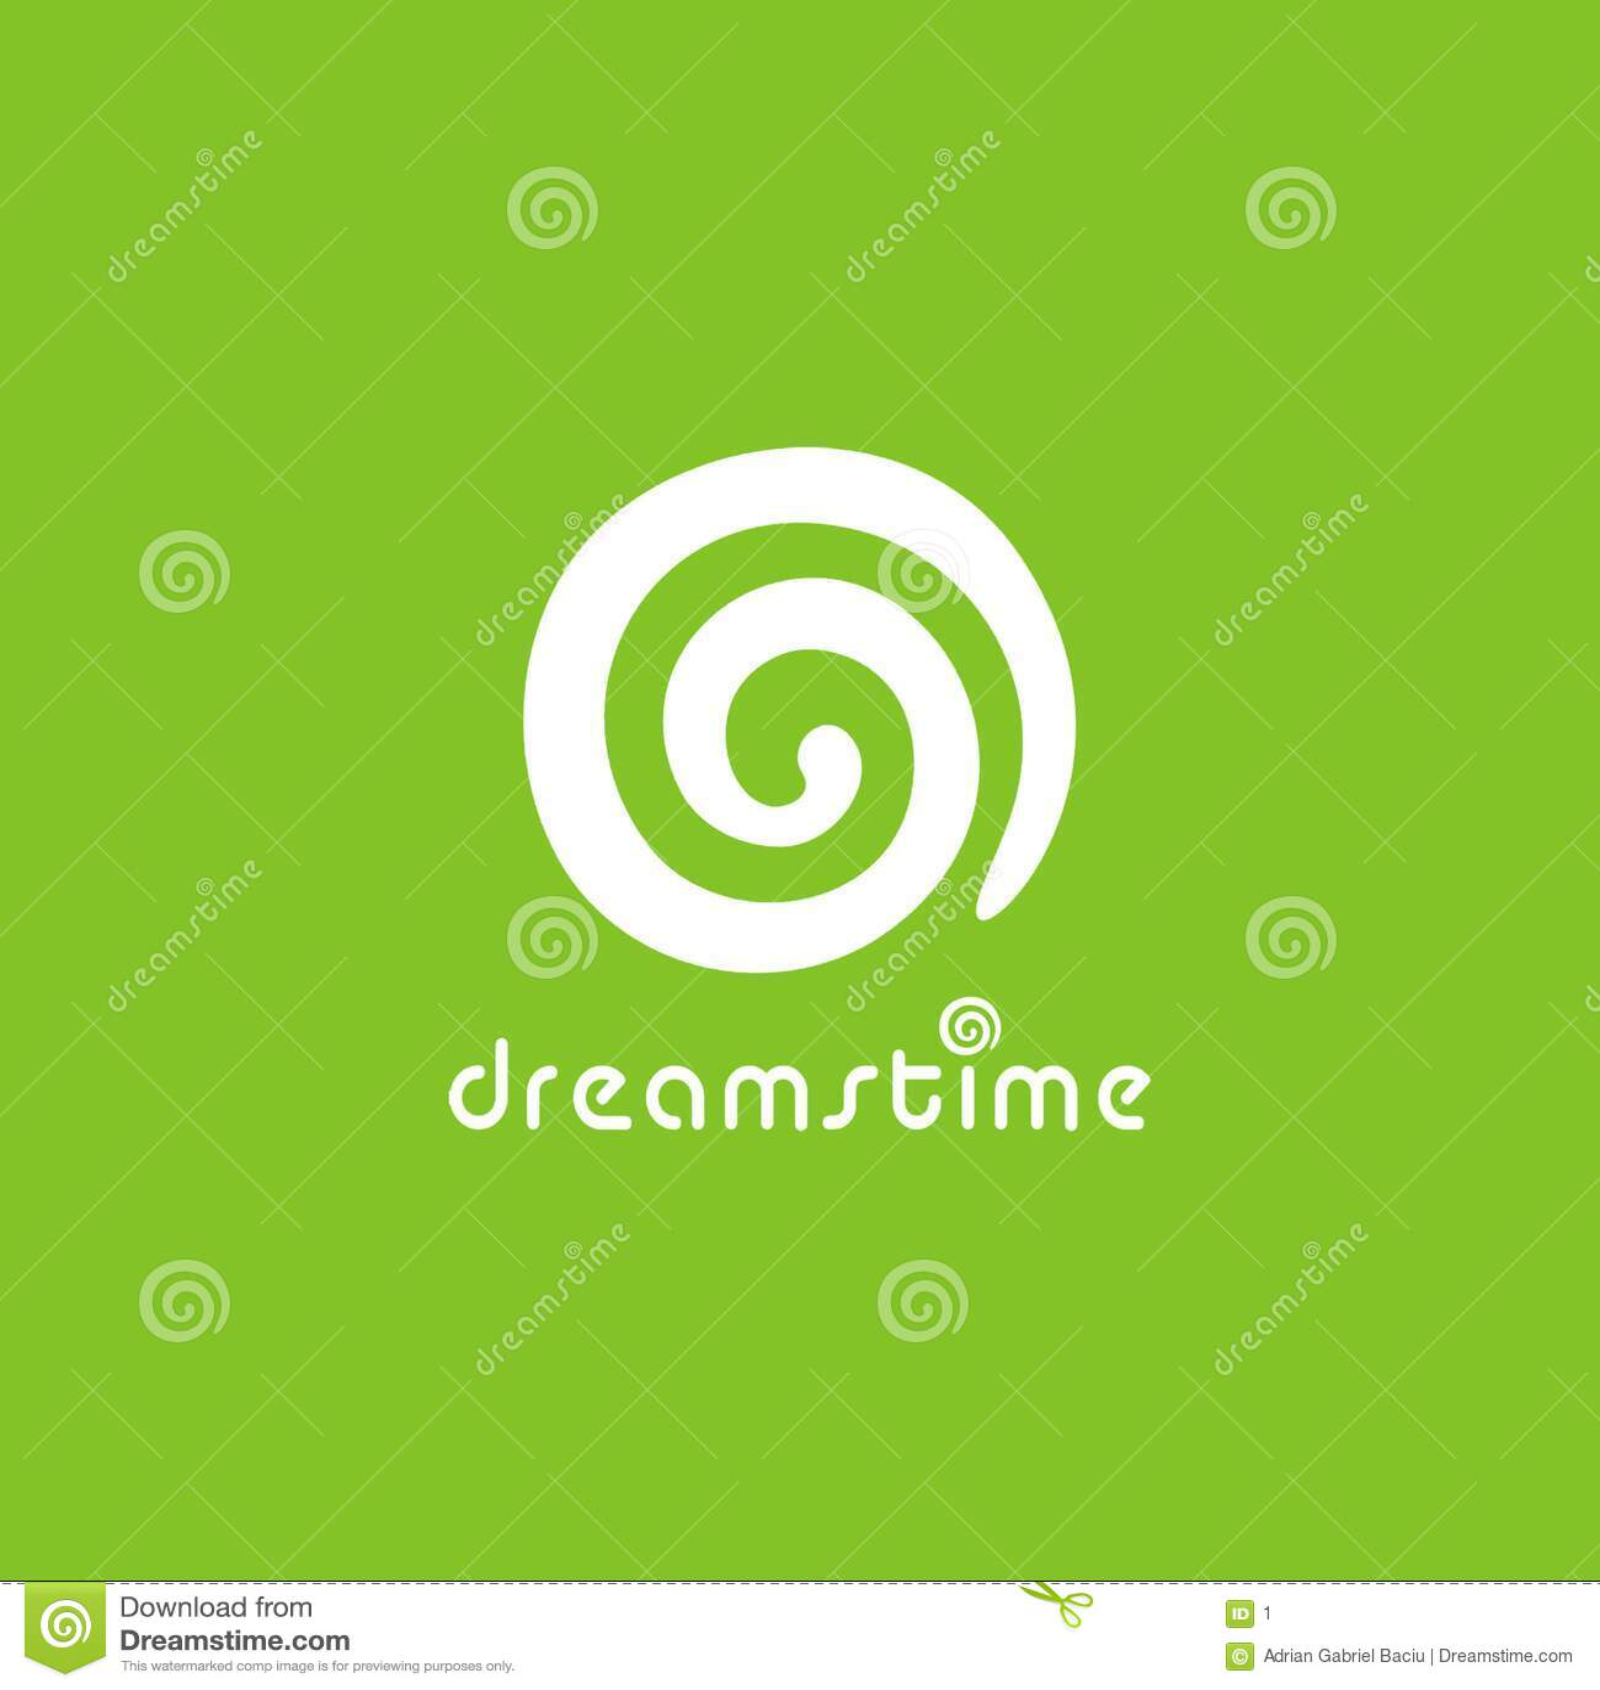 Dreamstime Generic Image Stock Image 1